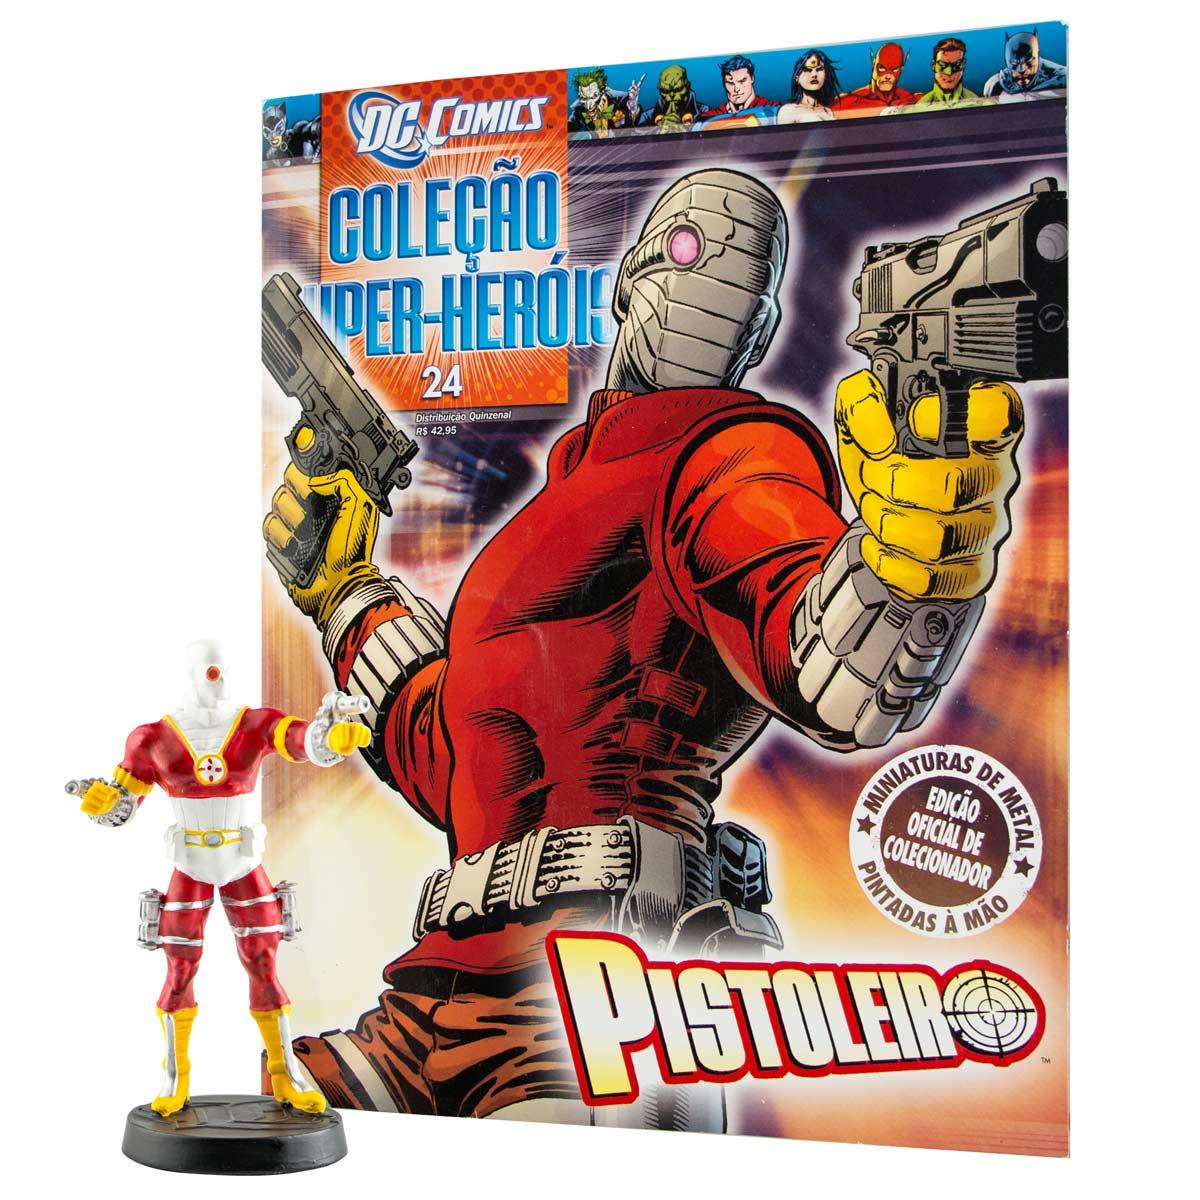 Boneco Miniatura Pistoleiro + Revista